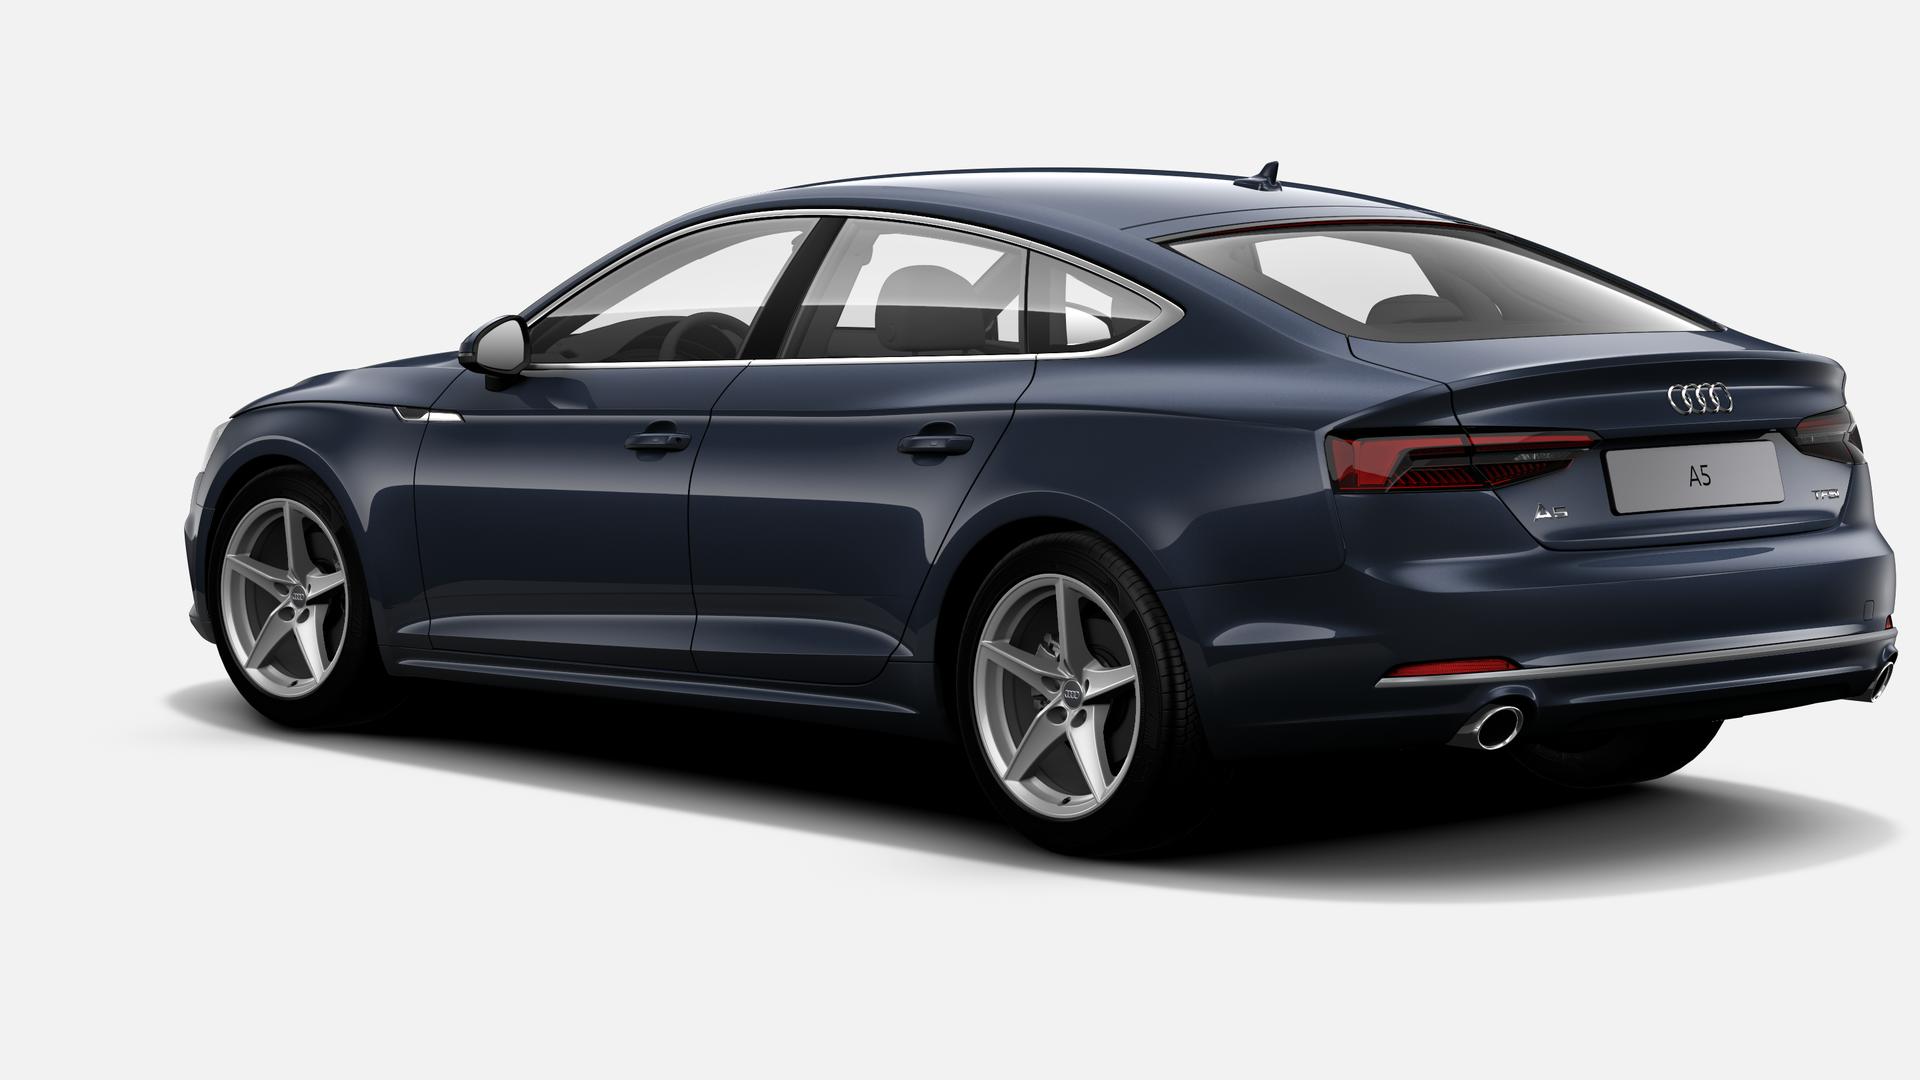 Vista Tres cuartos trasera izquierda de Audi A5 Sportback 2.0 TFSI Sport S tronic 140 kW (190 CV)